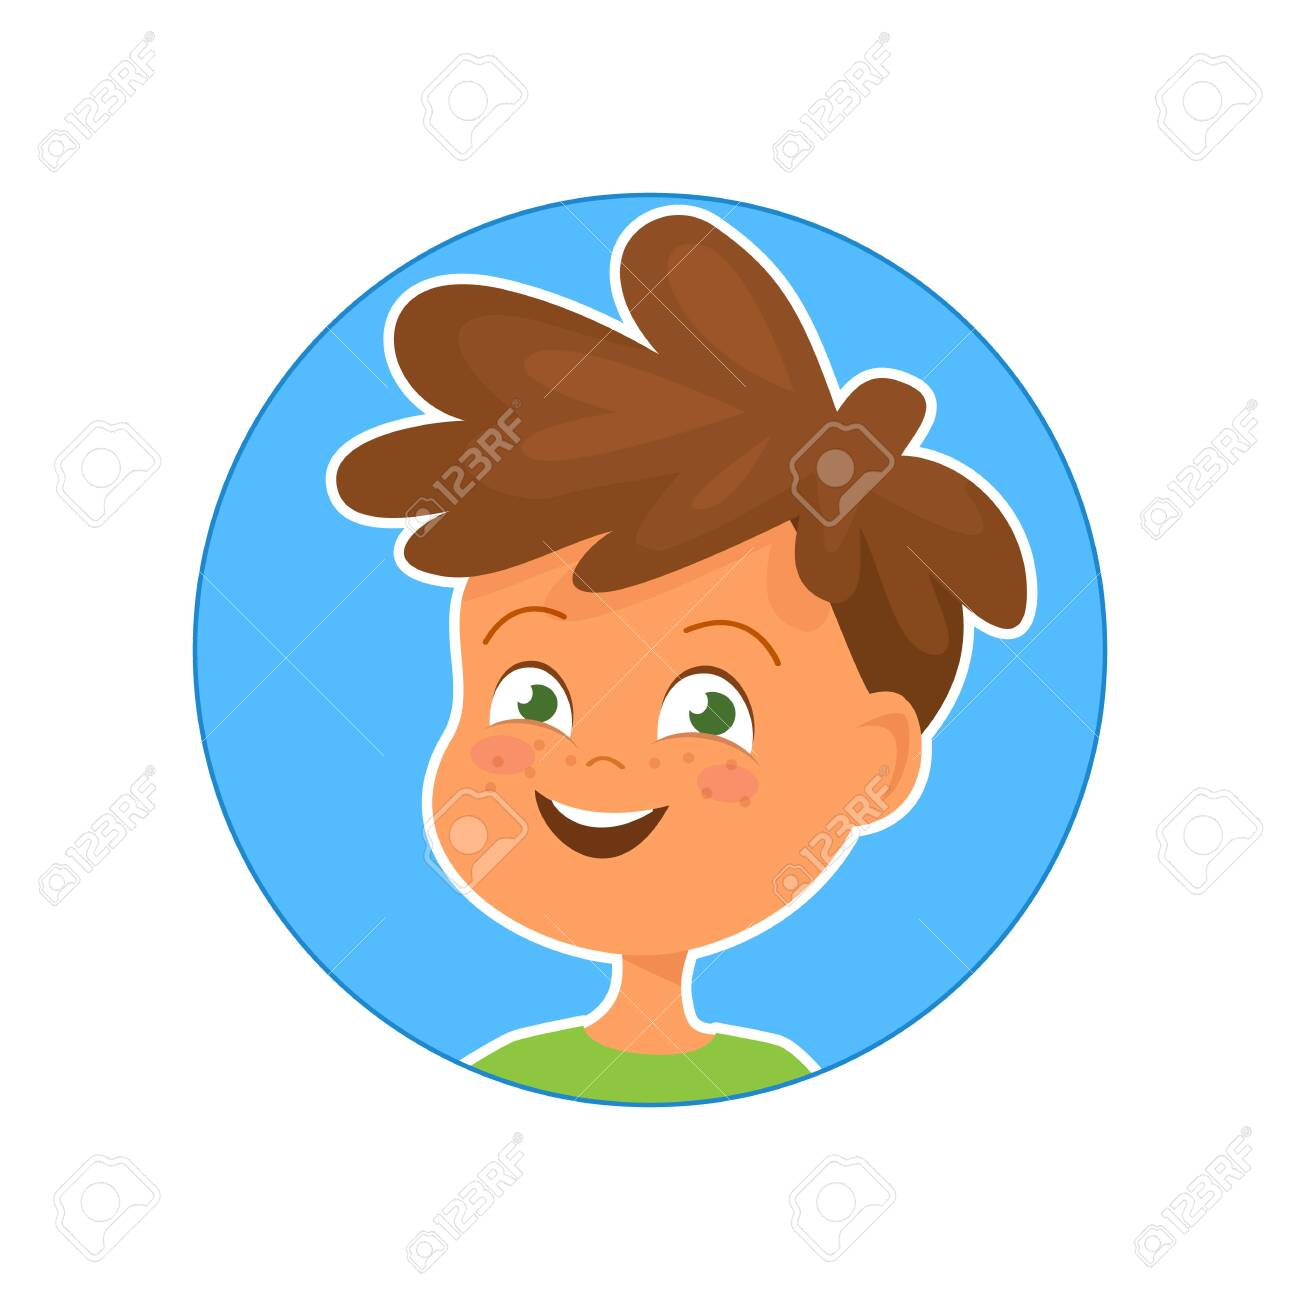 Vector illustration of happy boy on blue background - 130347064